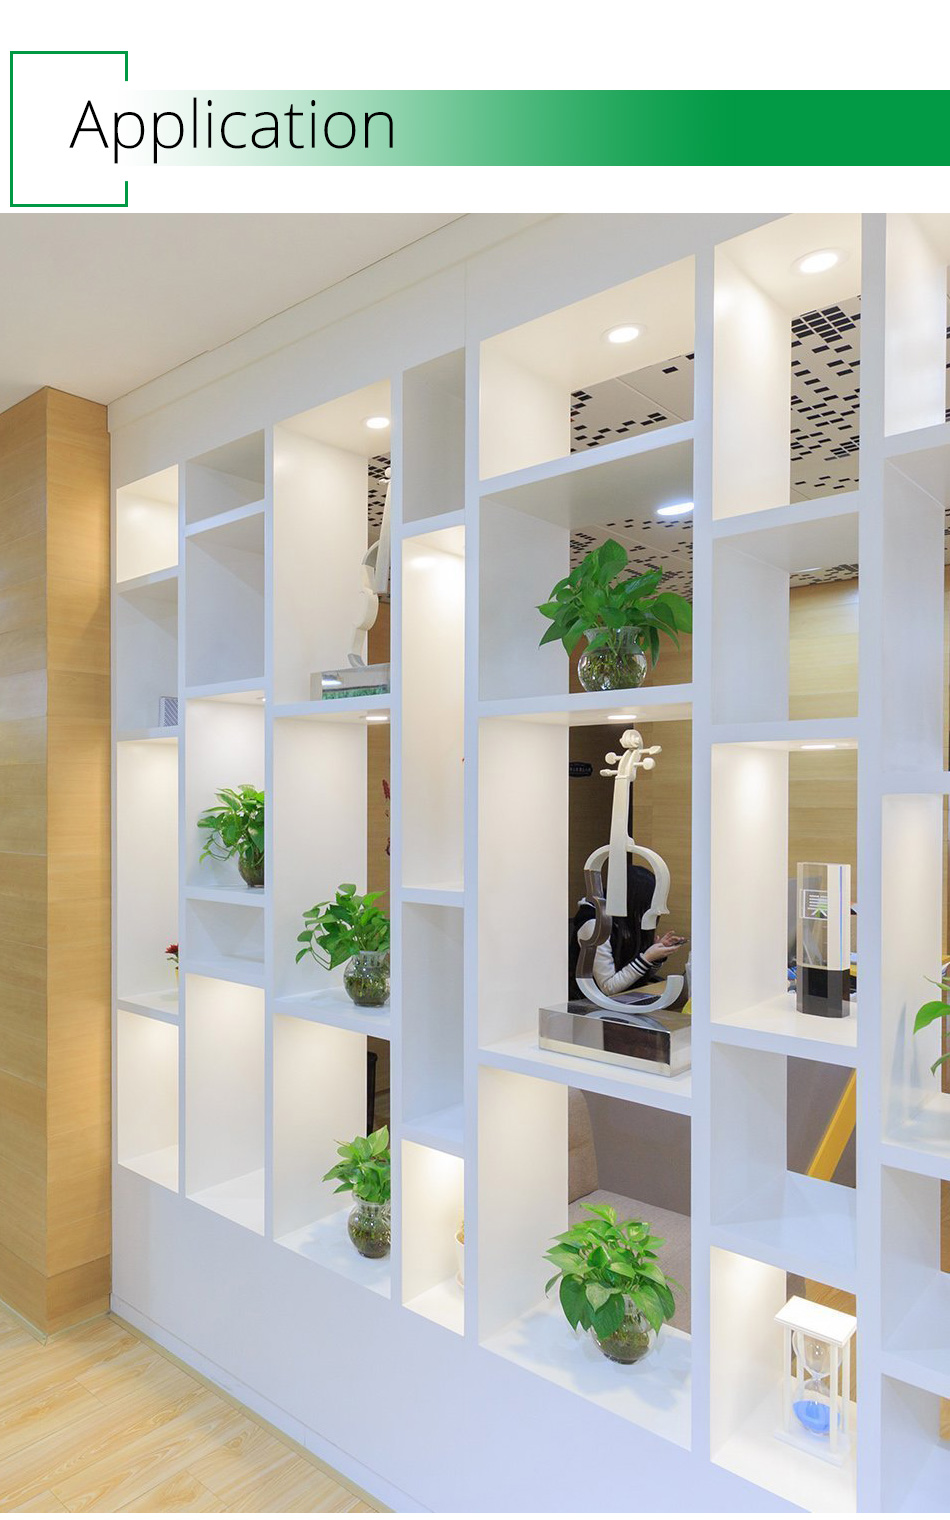 LED Under Cabinet Lights Motion Sensor Round Kitchen Cupboard Lighting Exhibition Bookshelf Furniture Night Light Counter Lamps11